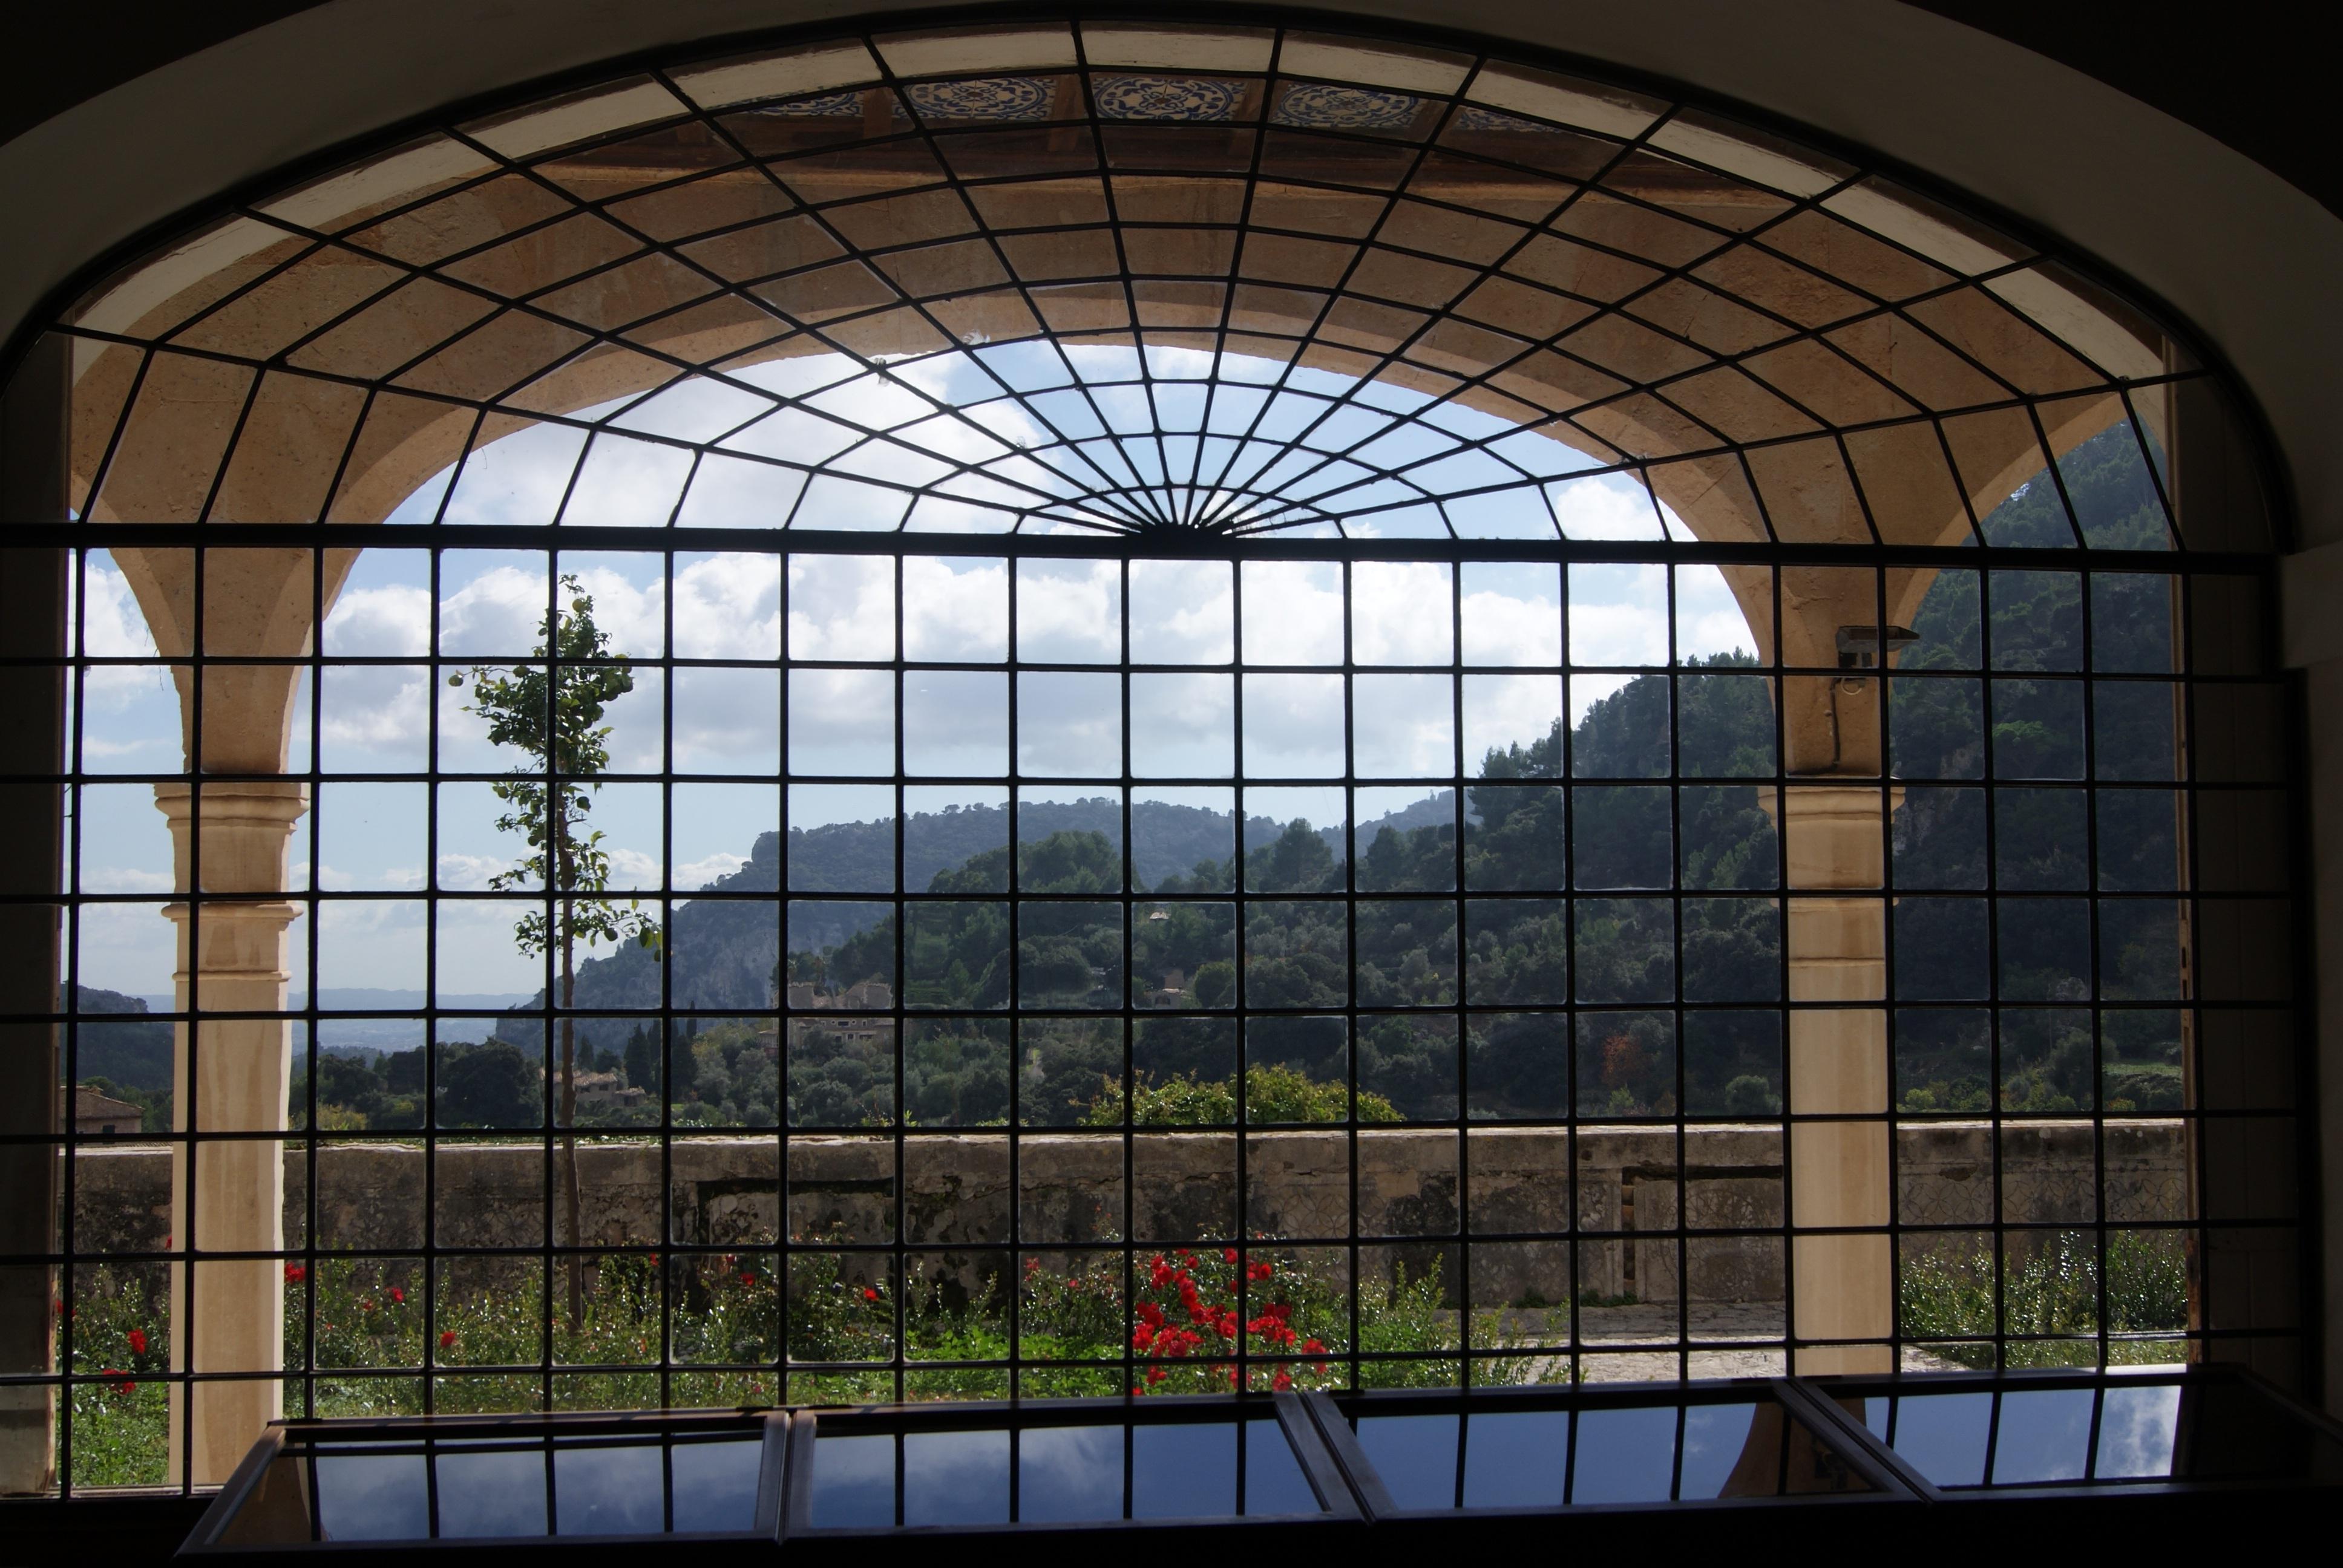 Images gratuites architecture villa fen tre verre vue cambre fa ade mat riel vitrail for Fenetre villa